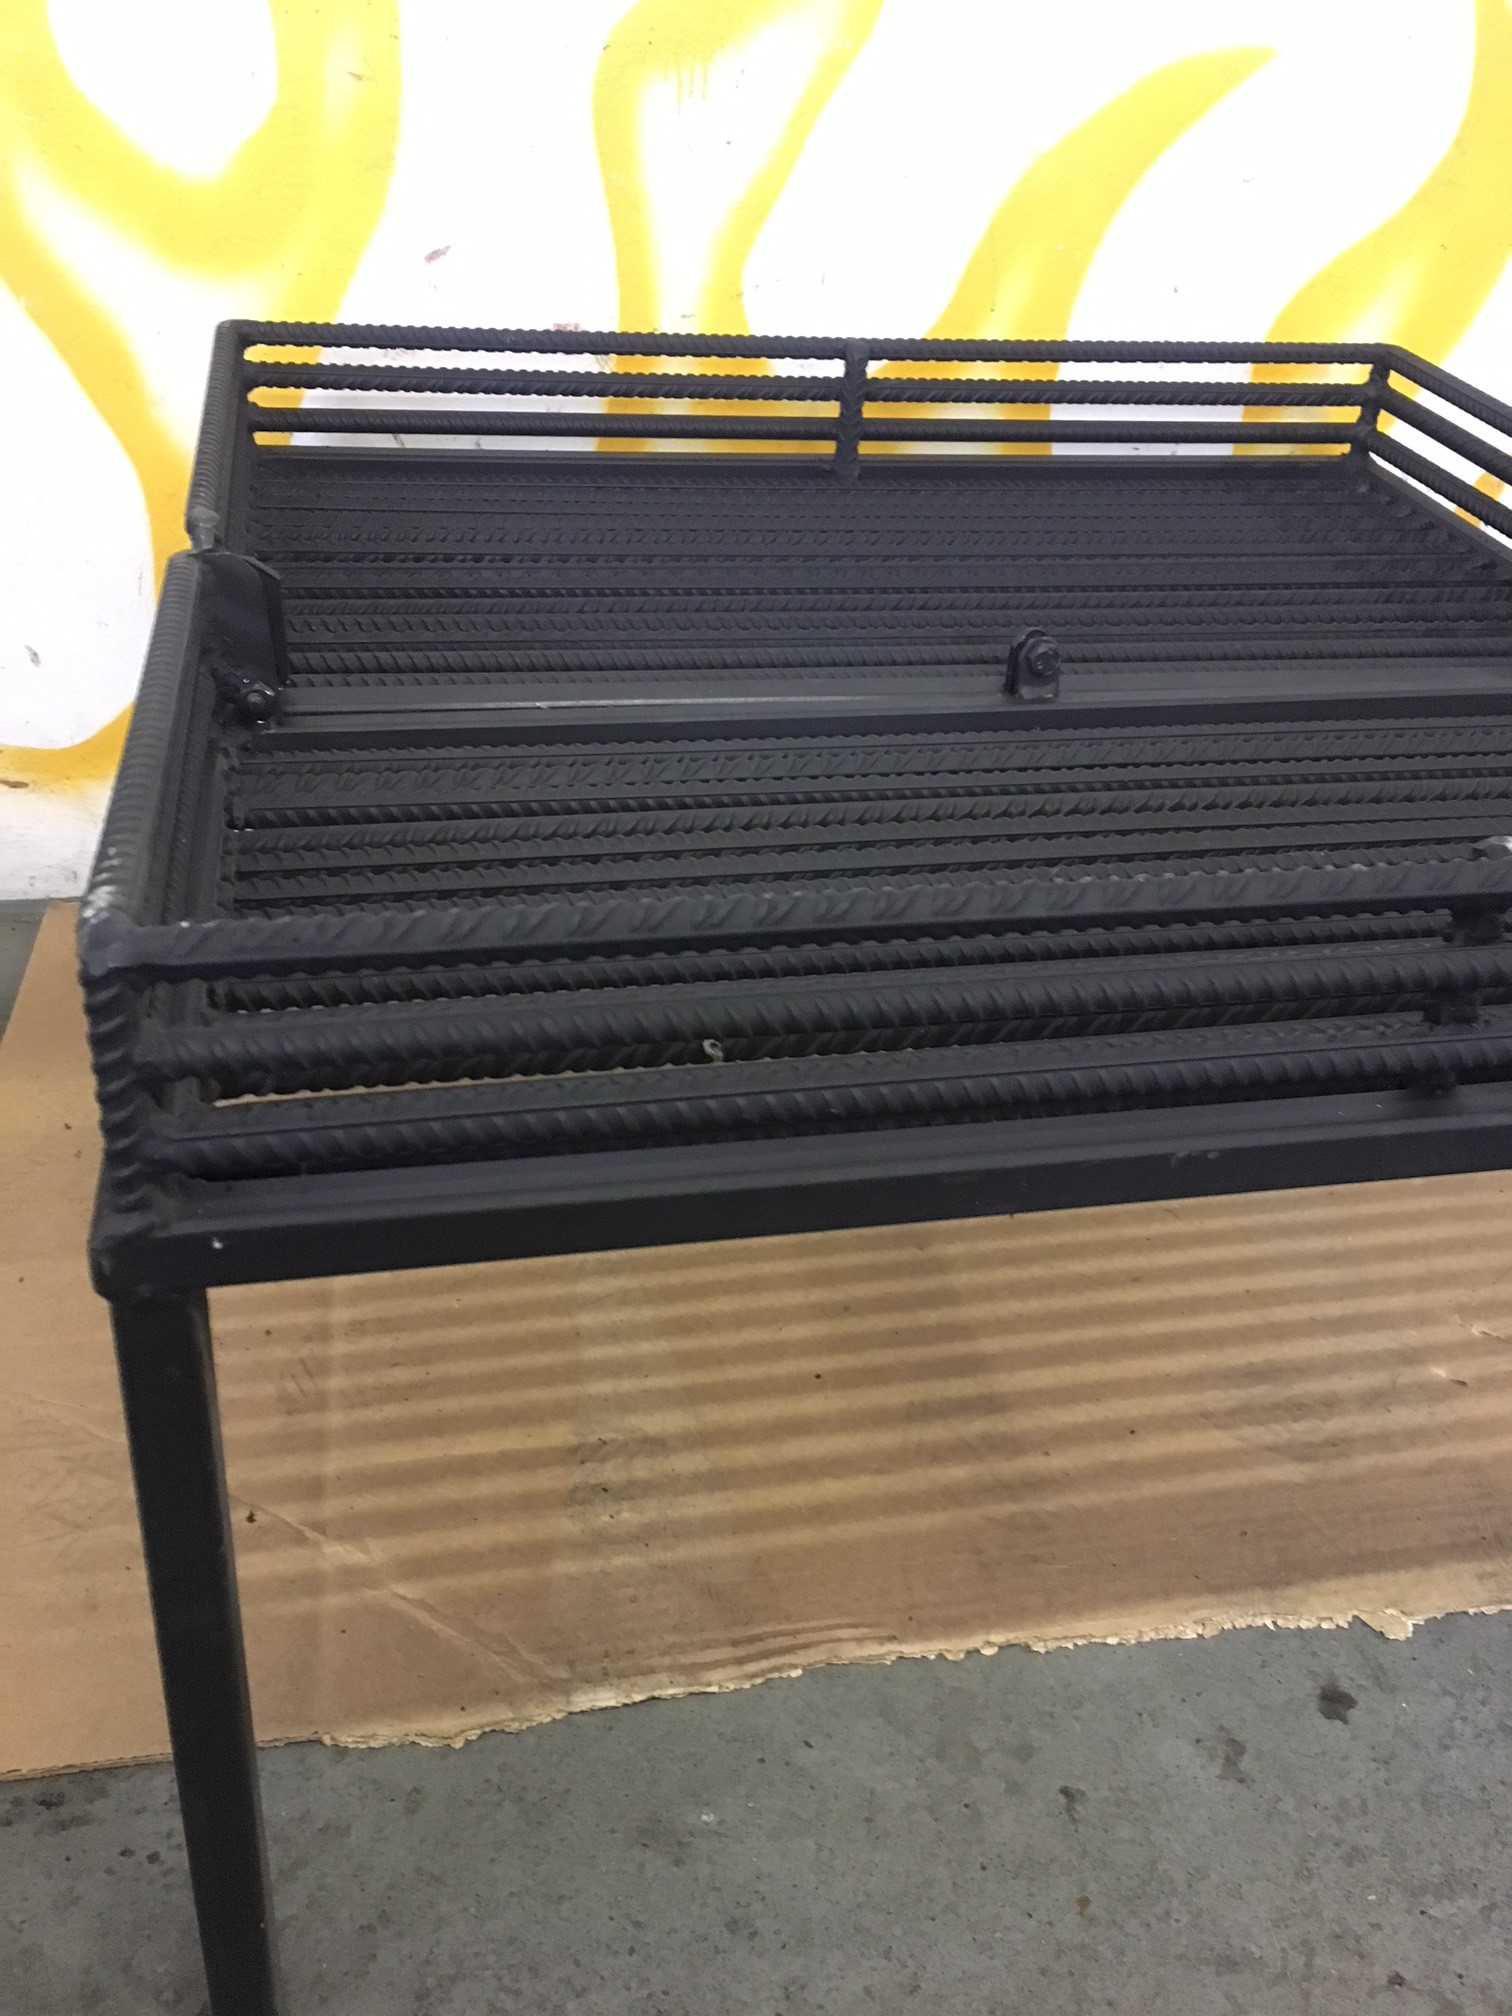 Charcoal tray/wood burning stove